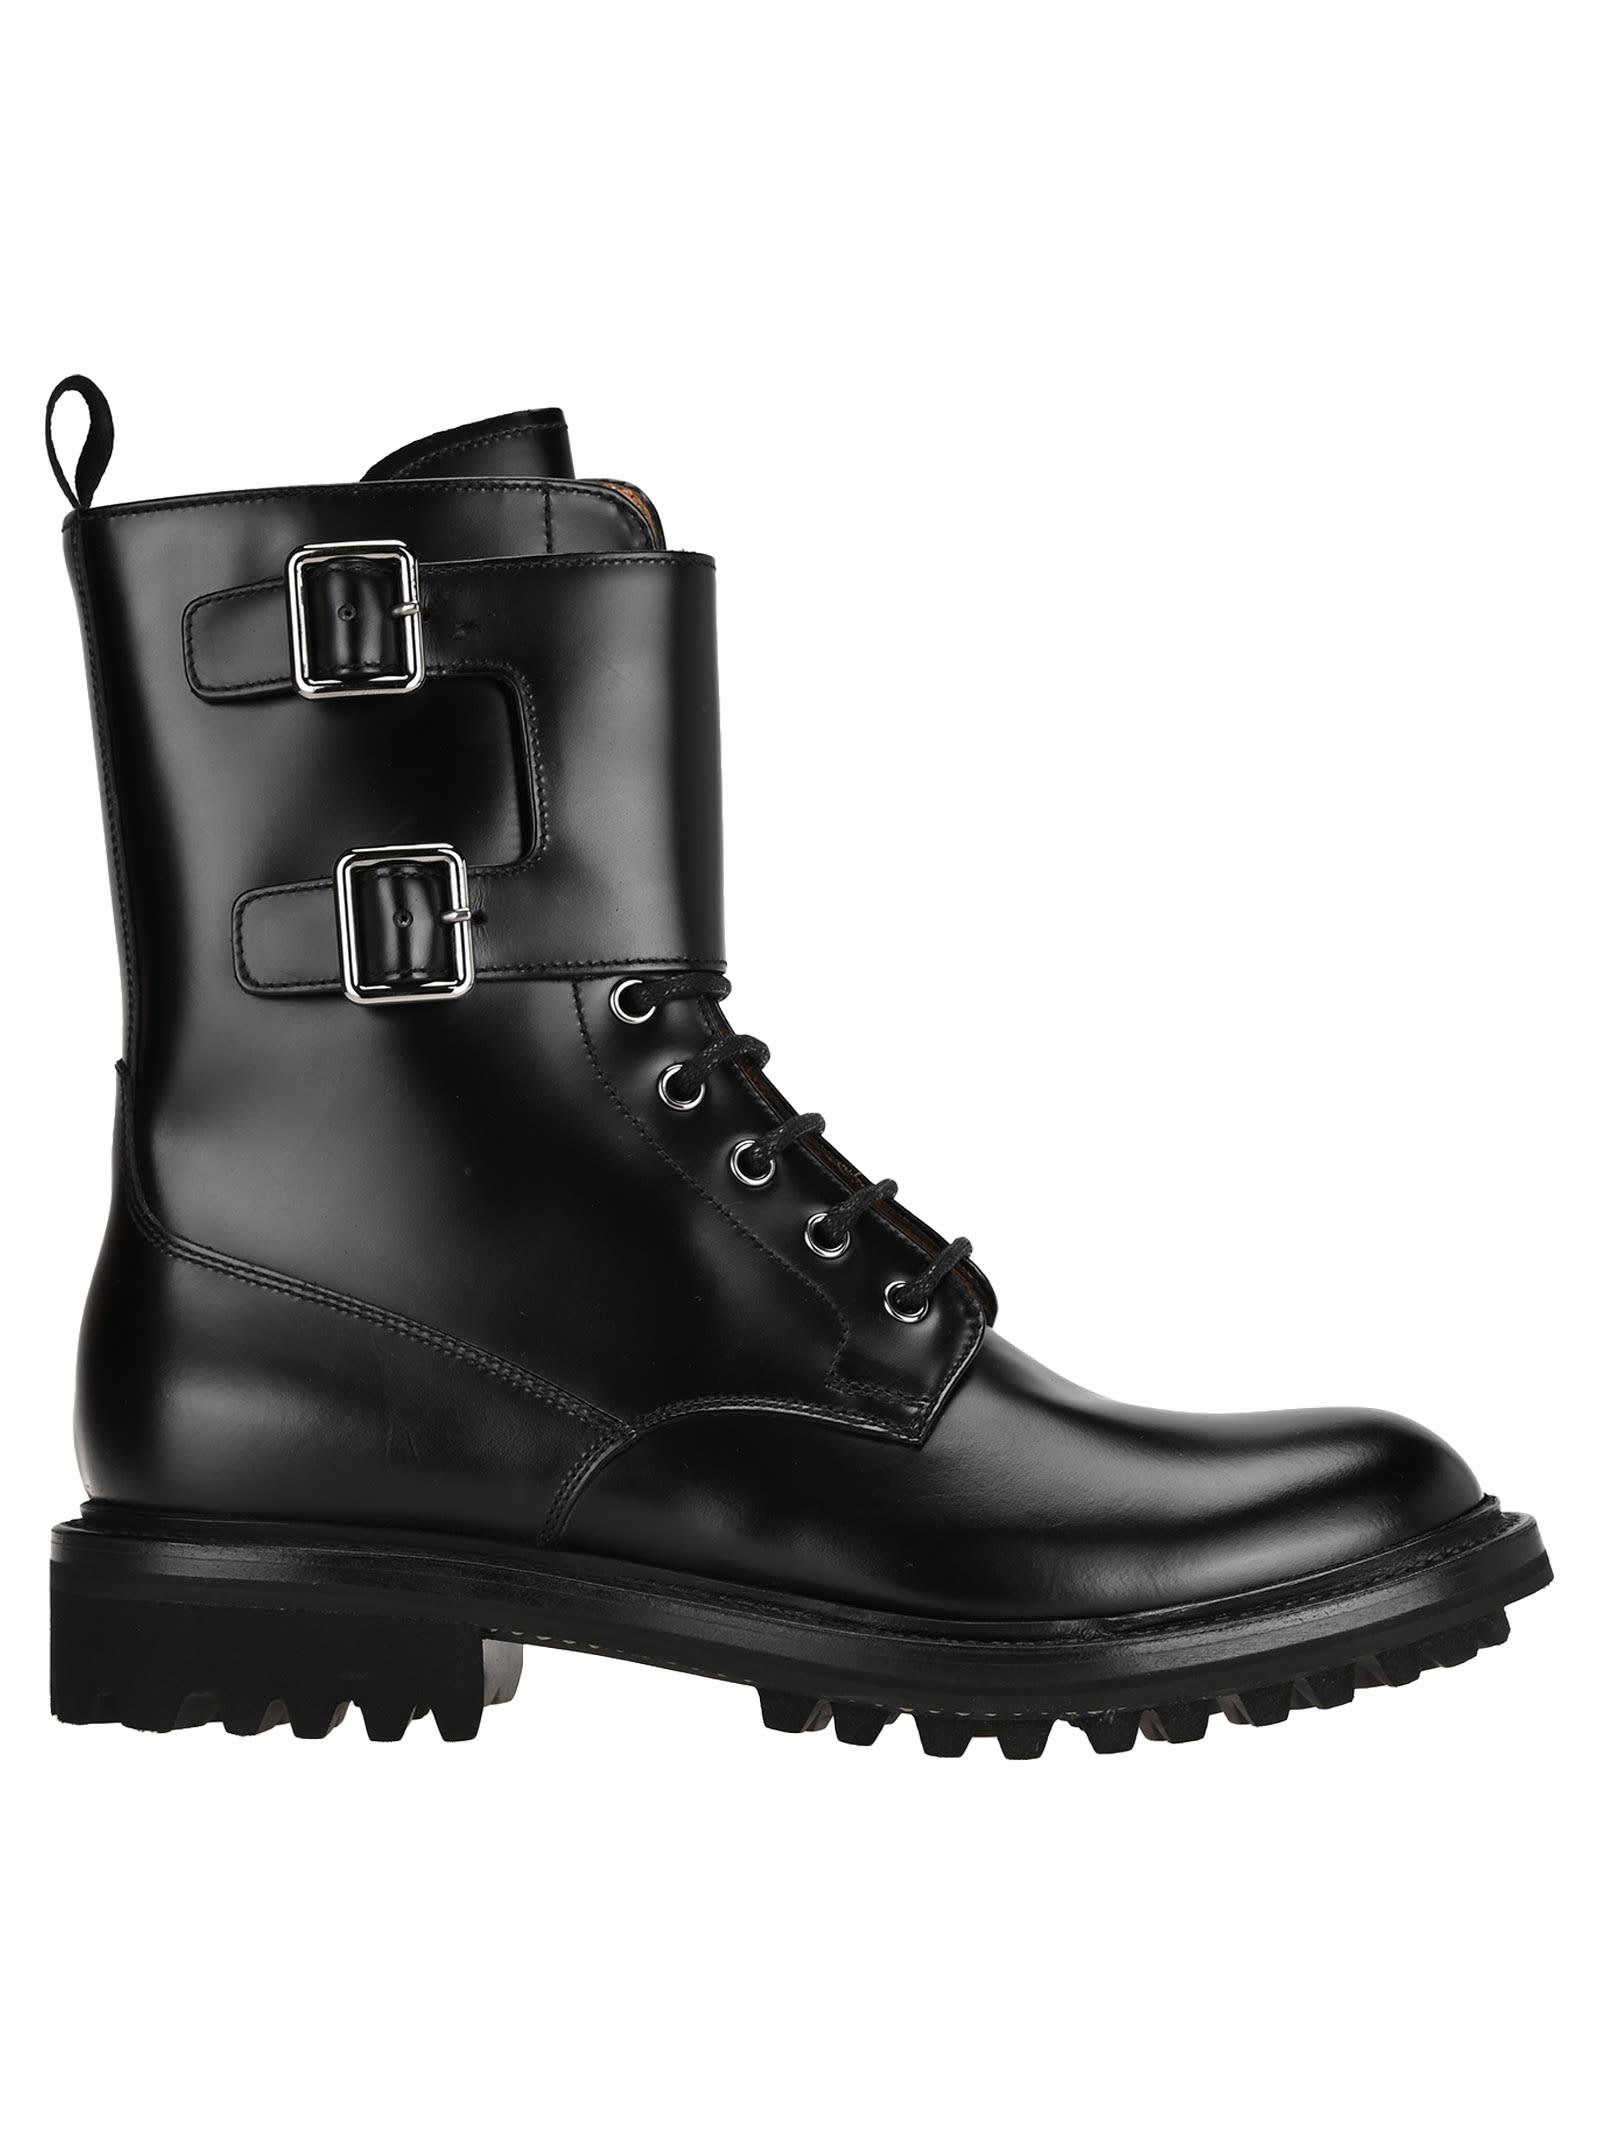 Churchs Carly Boots